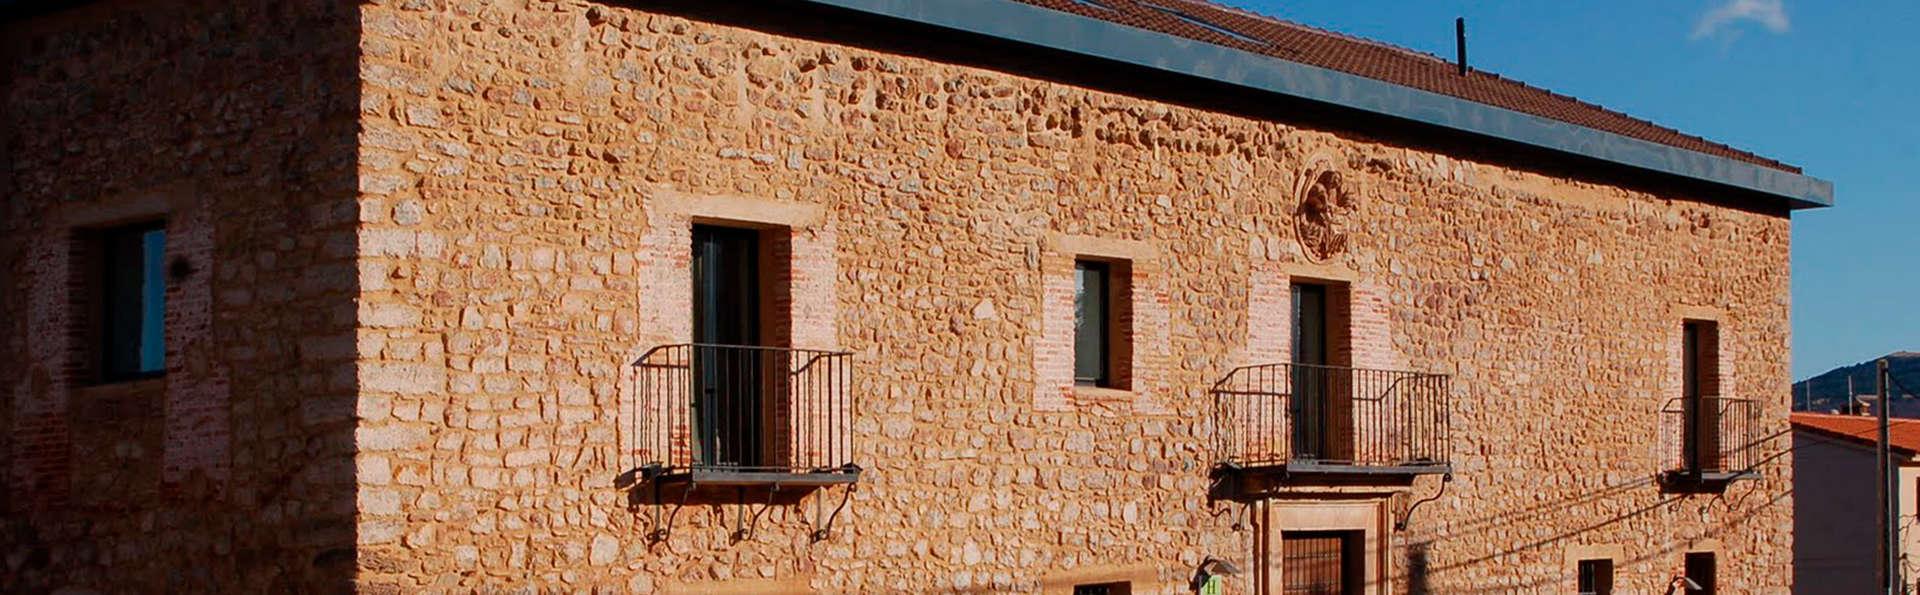 Hotel Convento Santa Ana - edit_front2.jpg